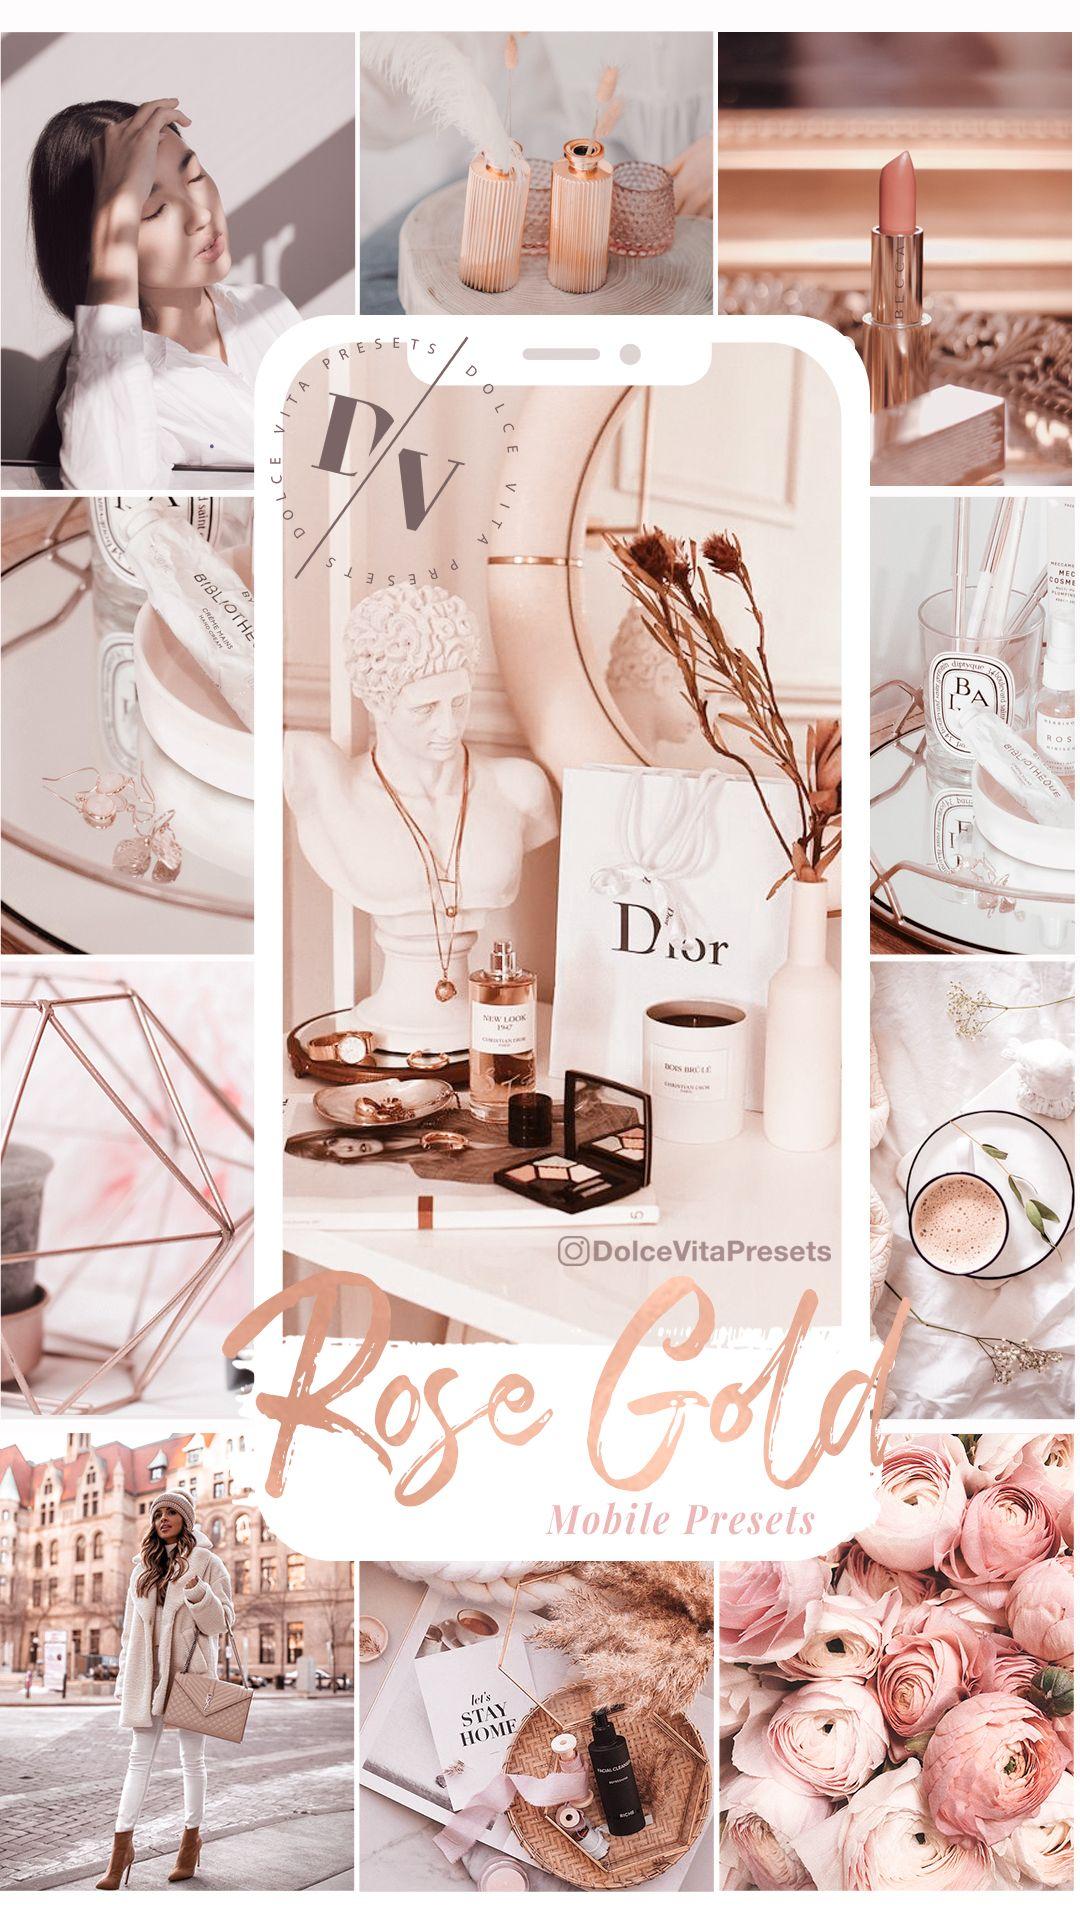 Rose Gold - 3 Luxurious Lightroom Presets